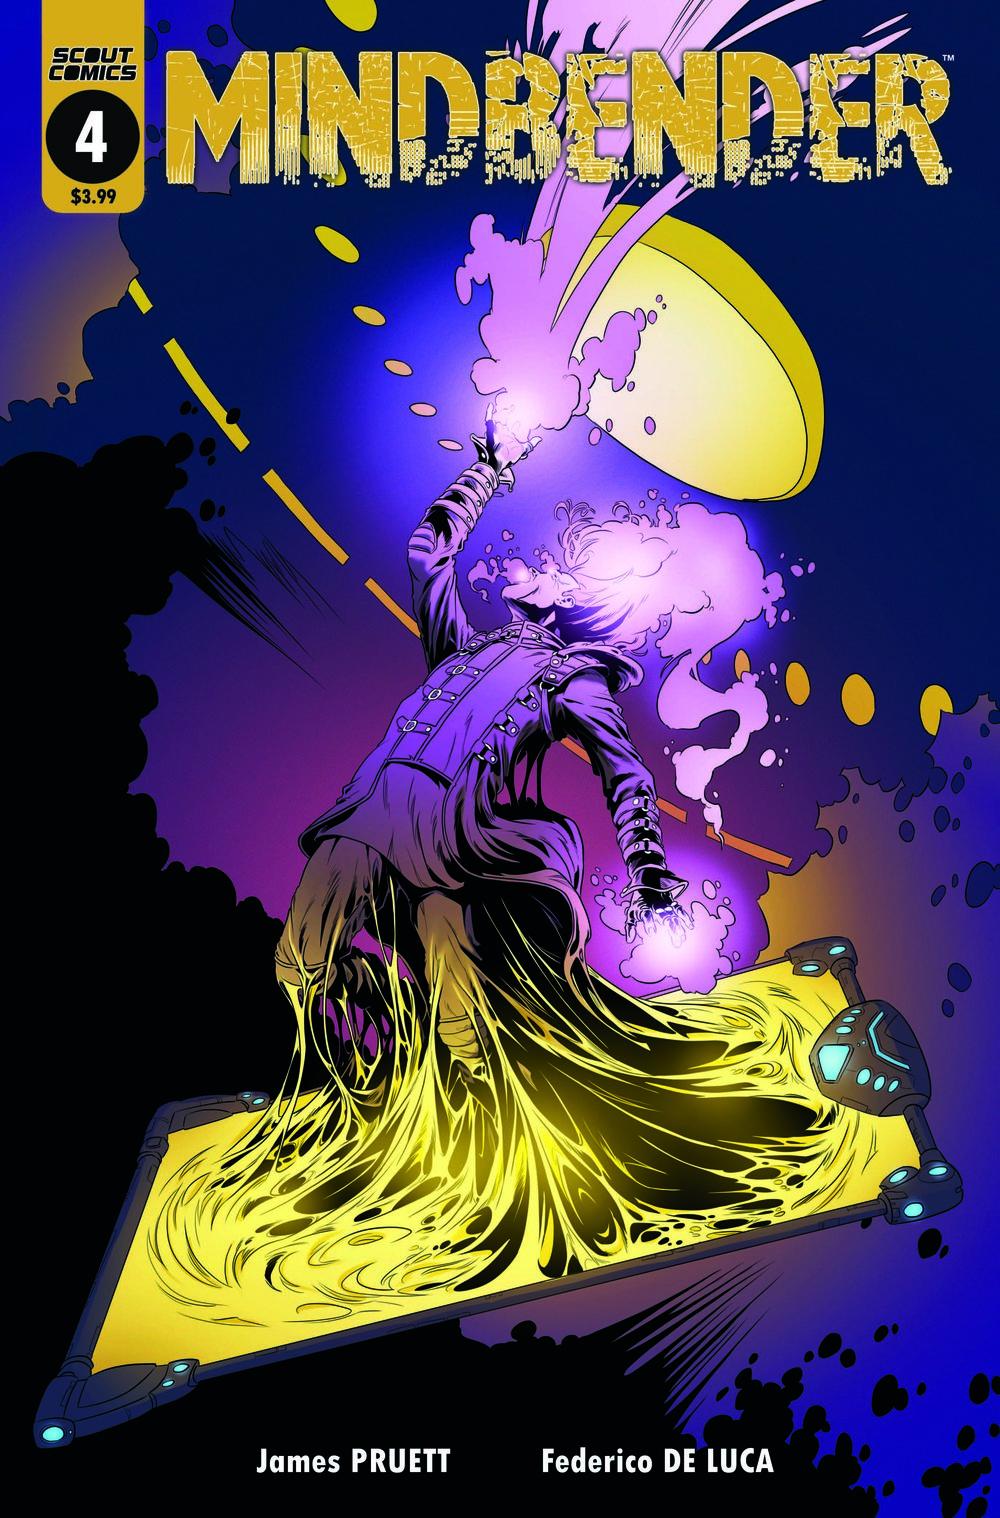 Mindbender 4 print cover.jpg